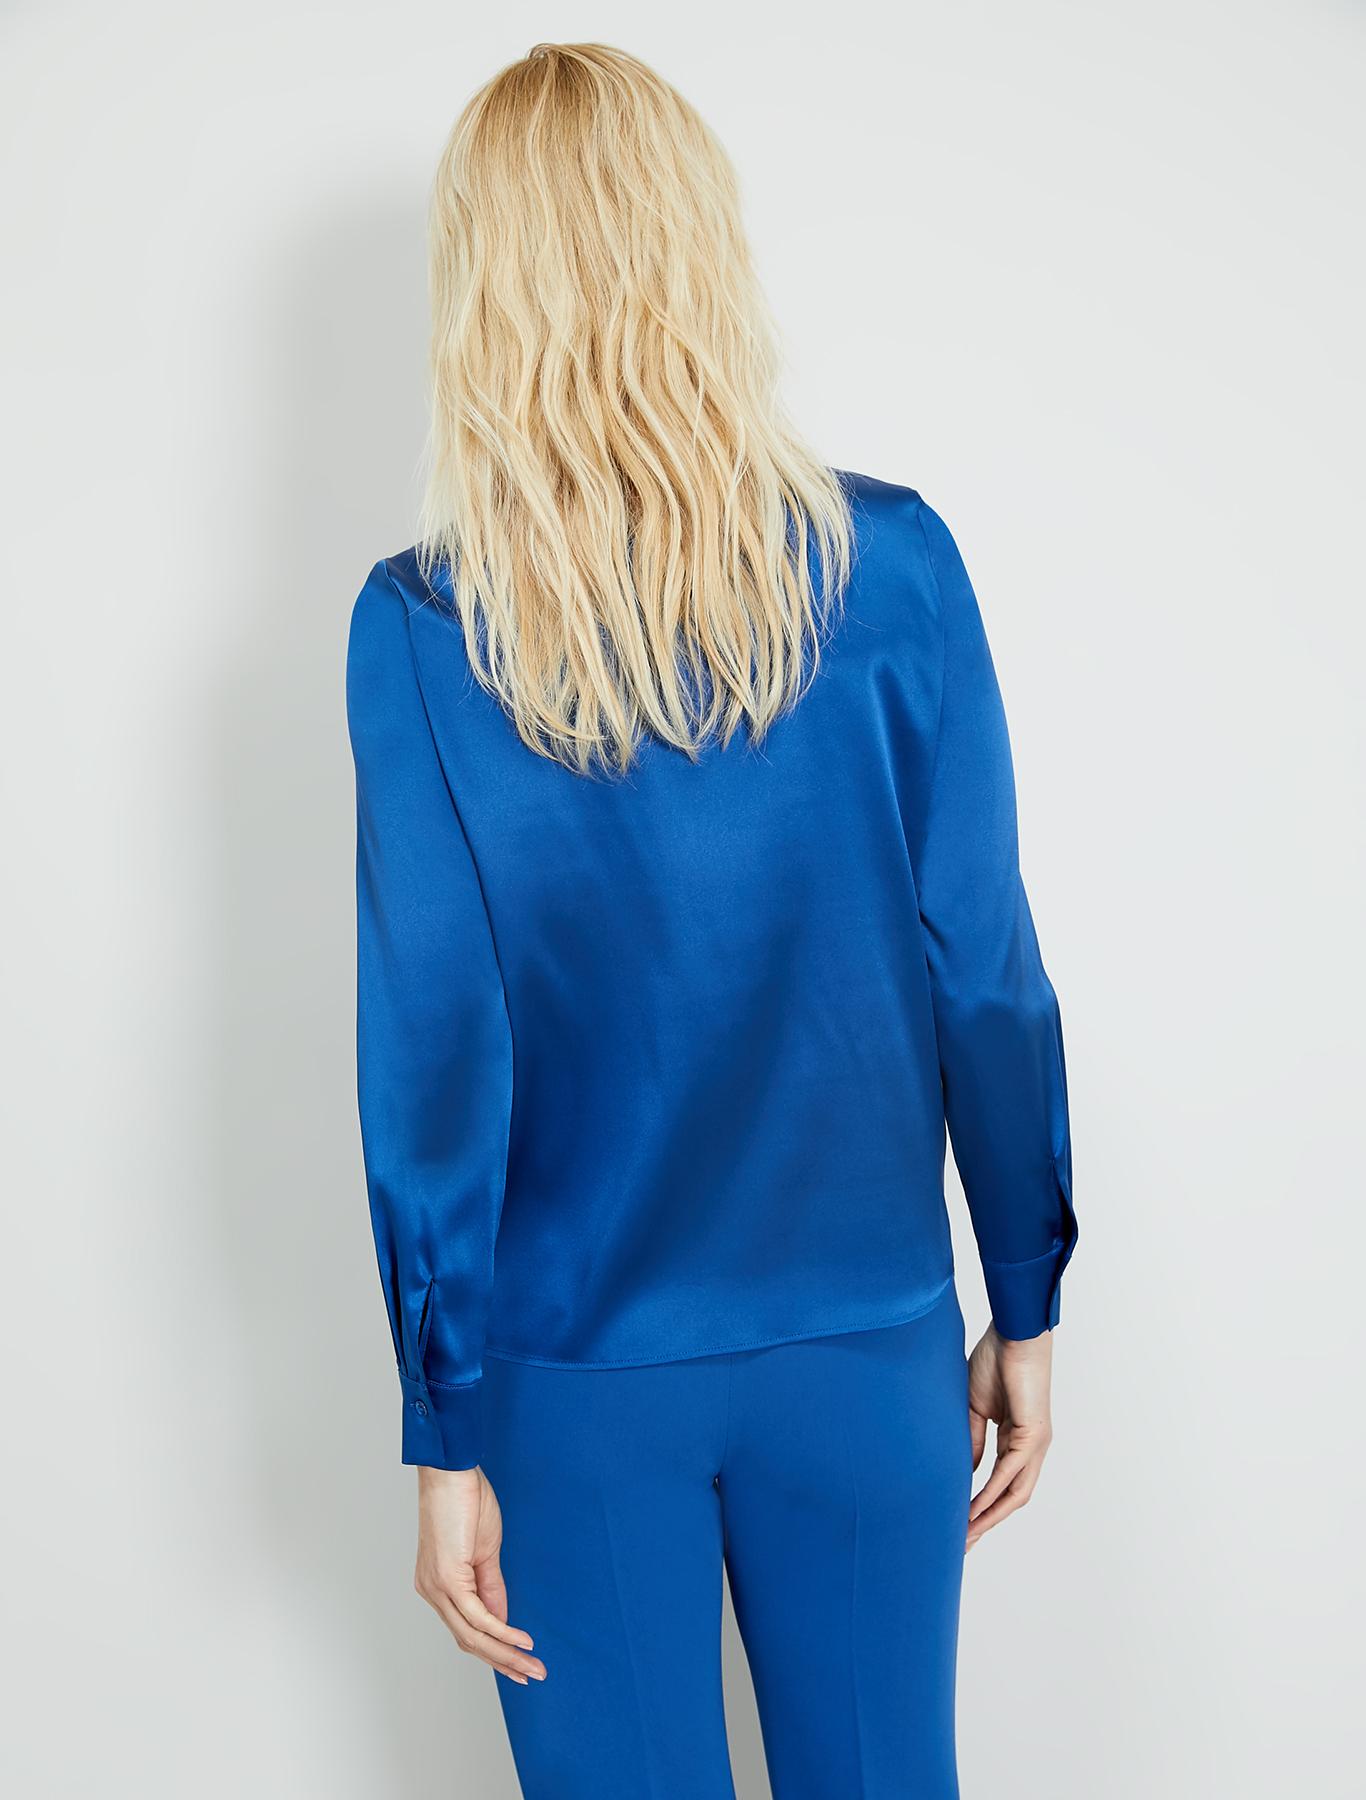 Silk satin shirt - air force blue - pennyblack